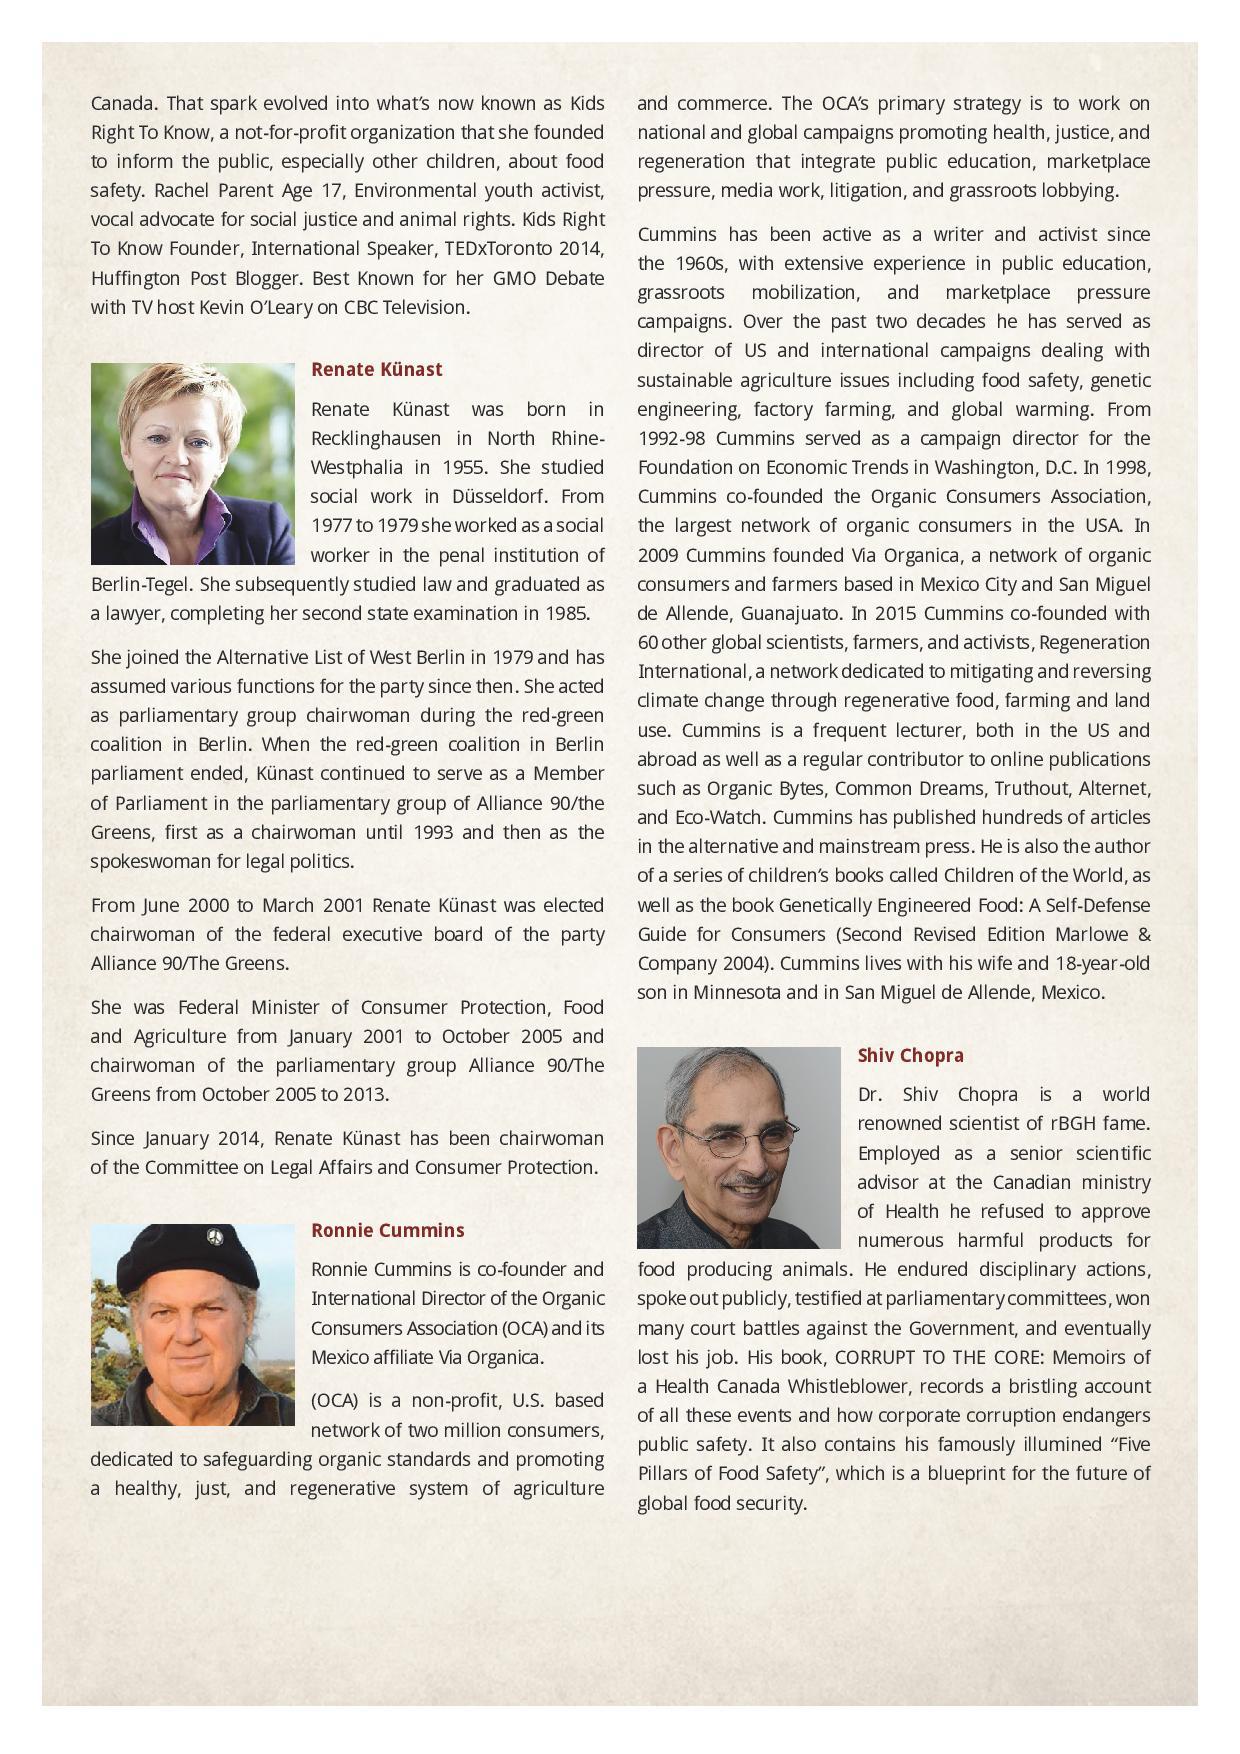 pa_speaker_bios-page-005